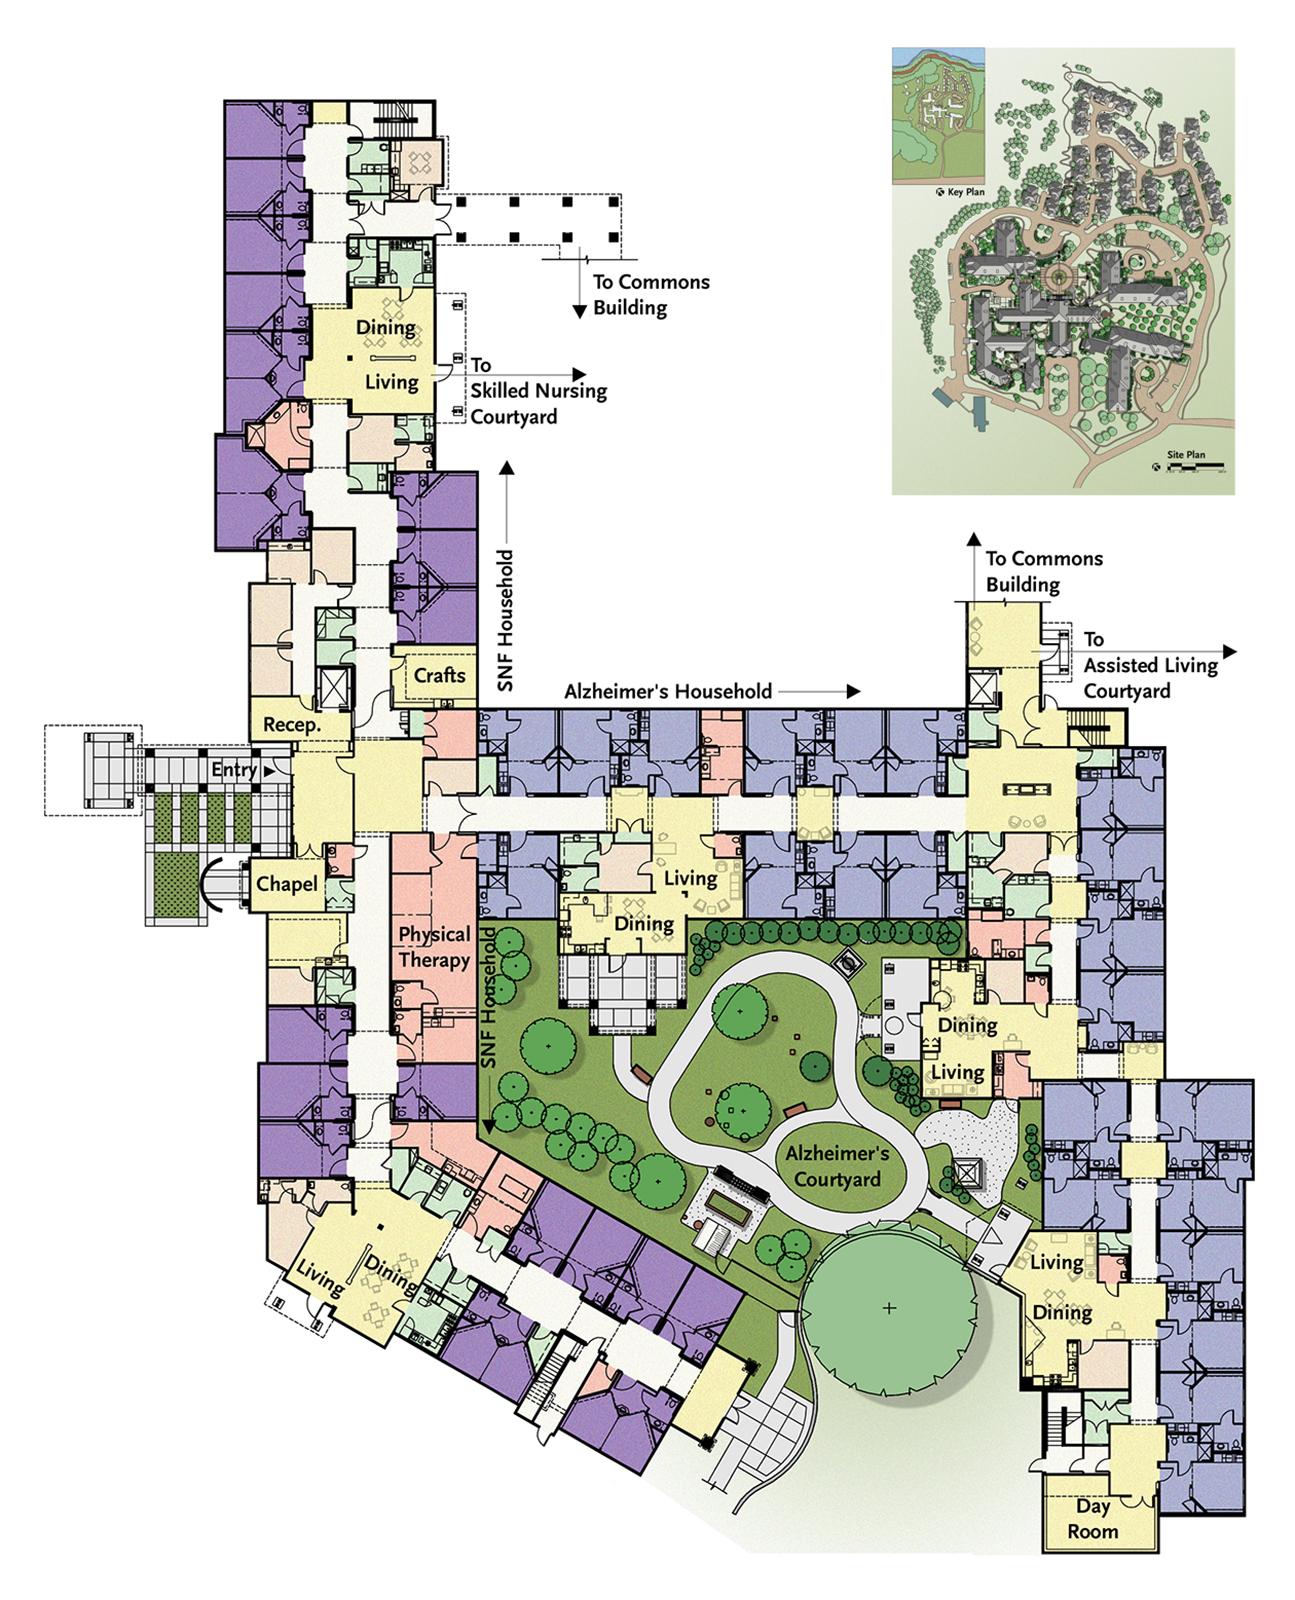 Elegant Home Design Ideas Picture Nursing Sample Strategy And Nursing Home Design  Plans Brightchat Co.